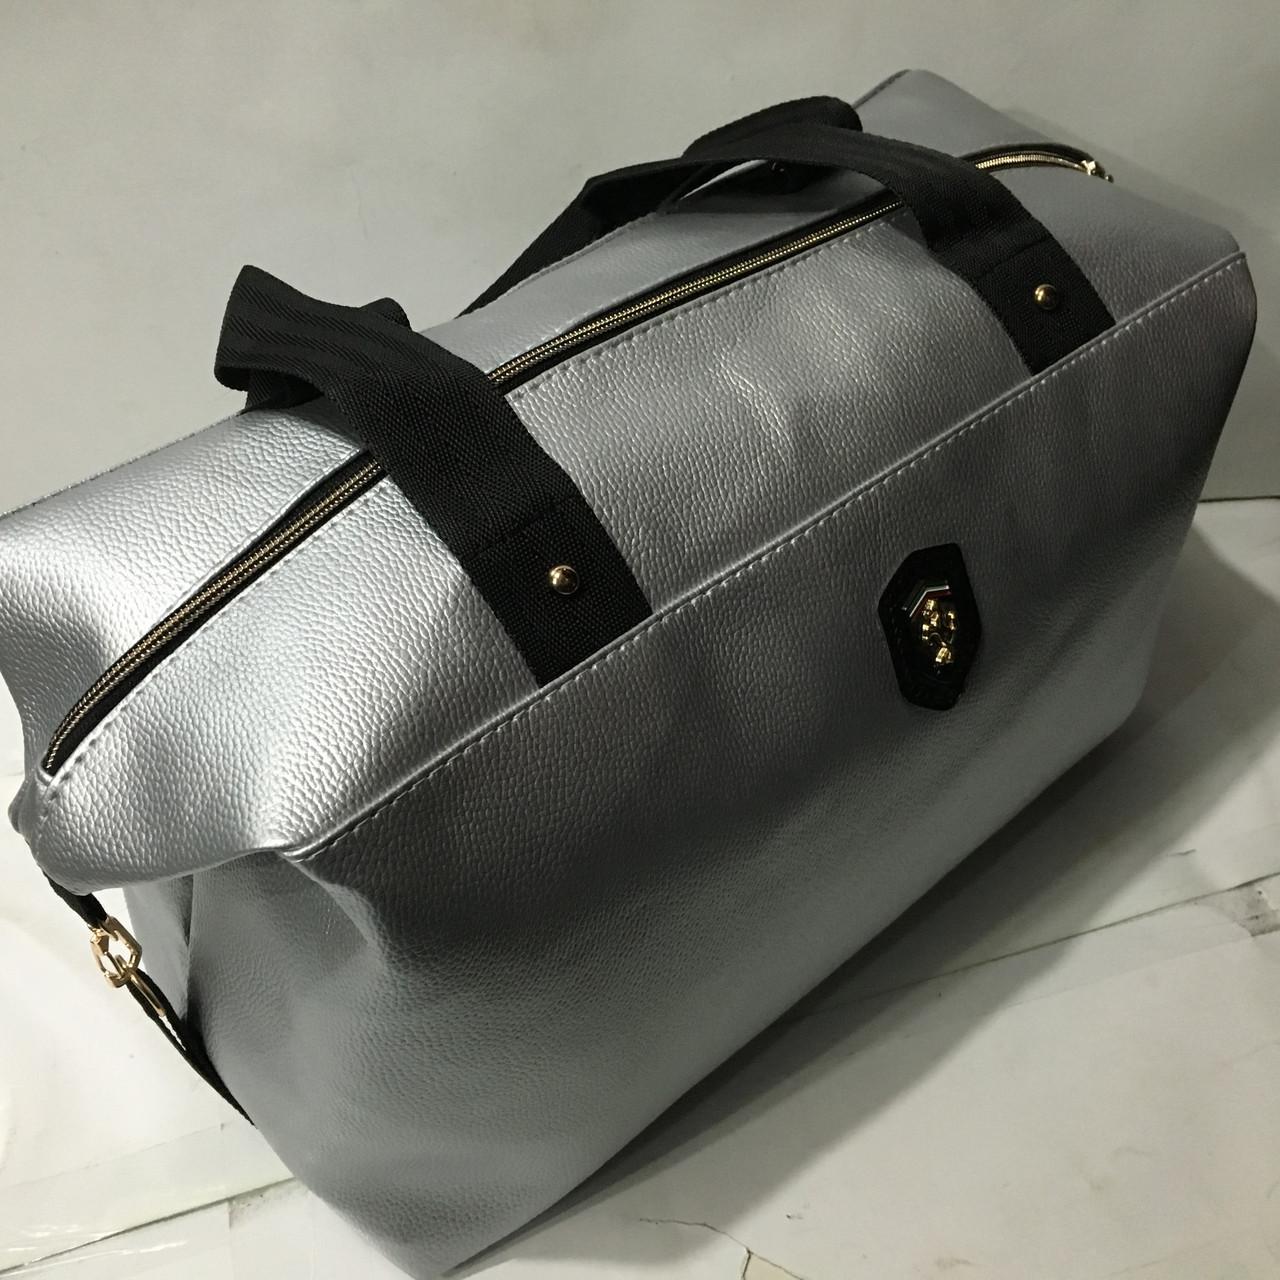 e775597d Женская спортивная сумка PUMA Ferrari, сумка Пума Феррари оптом, ...